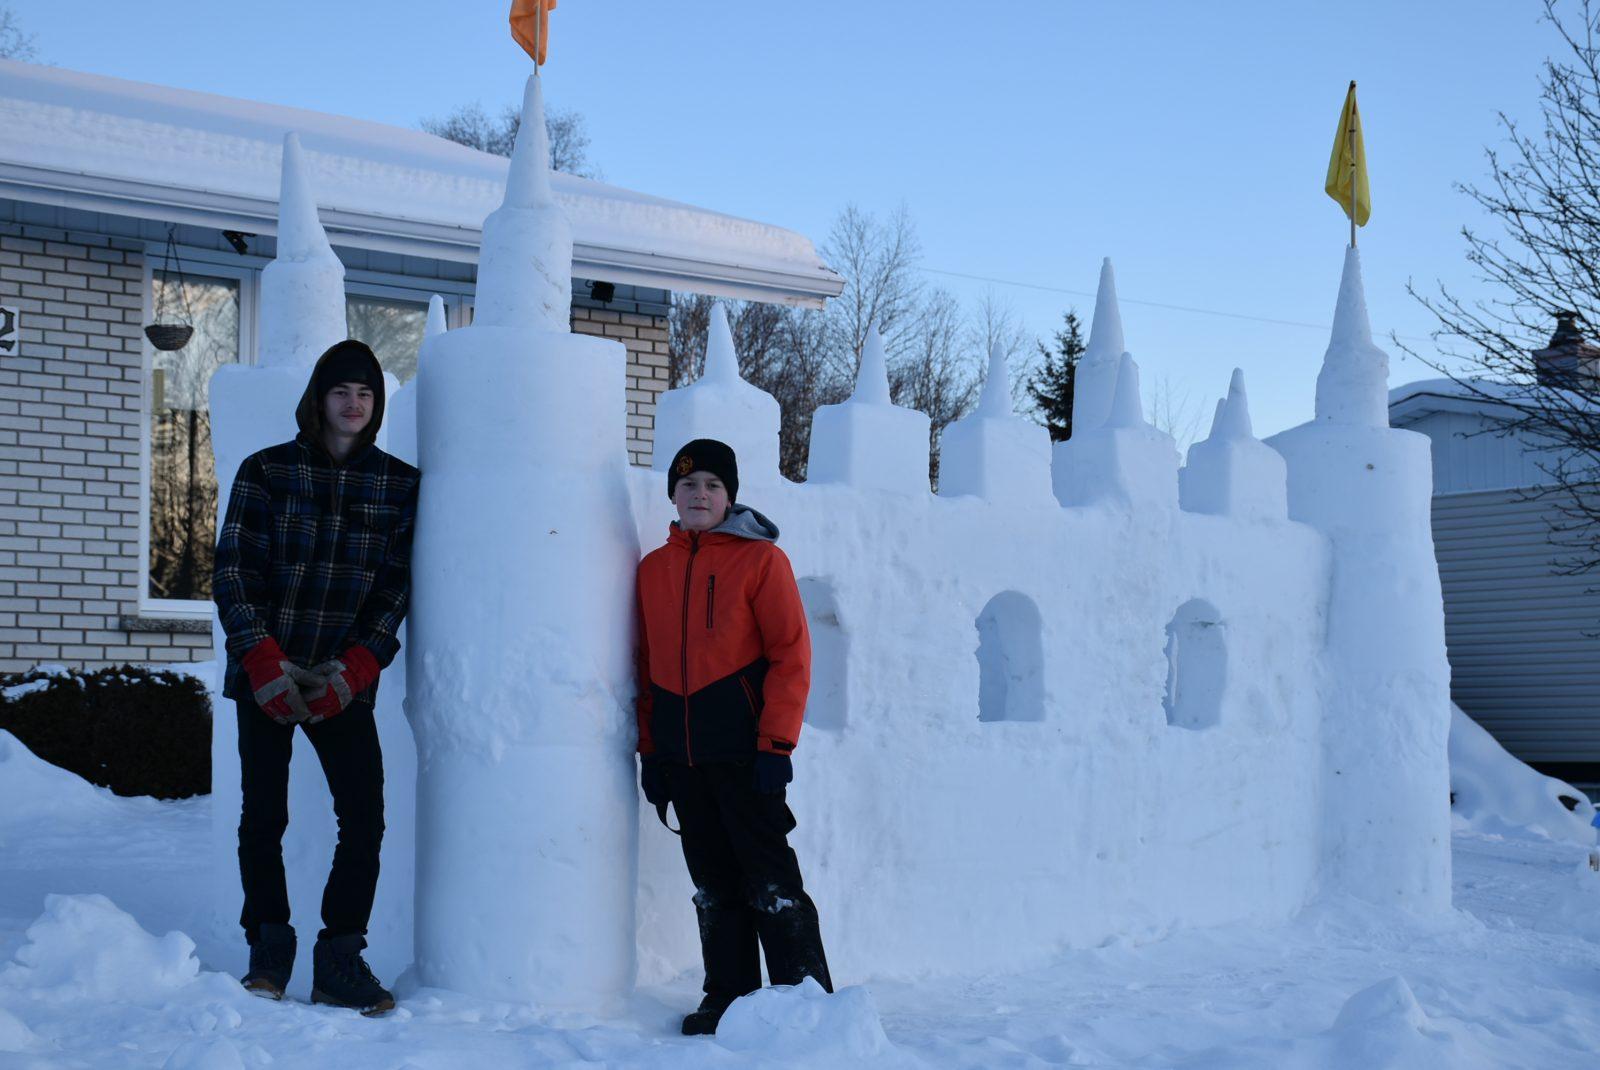 Un château de neige qui attire bien des regards